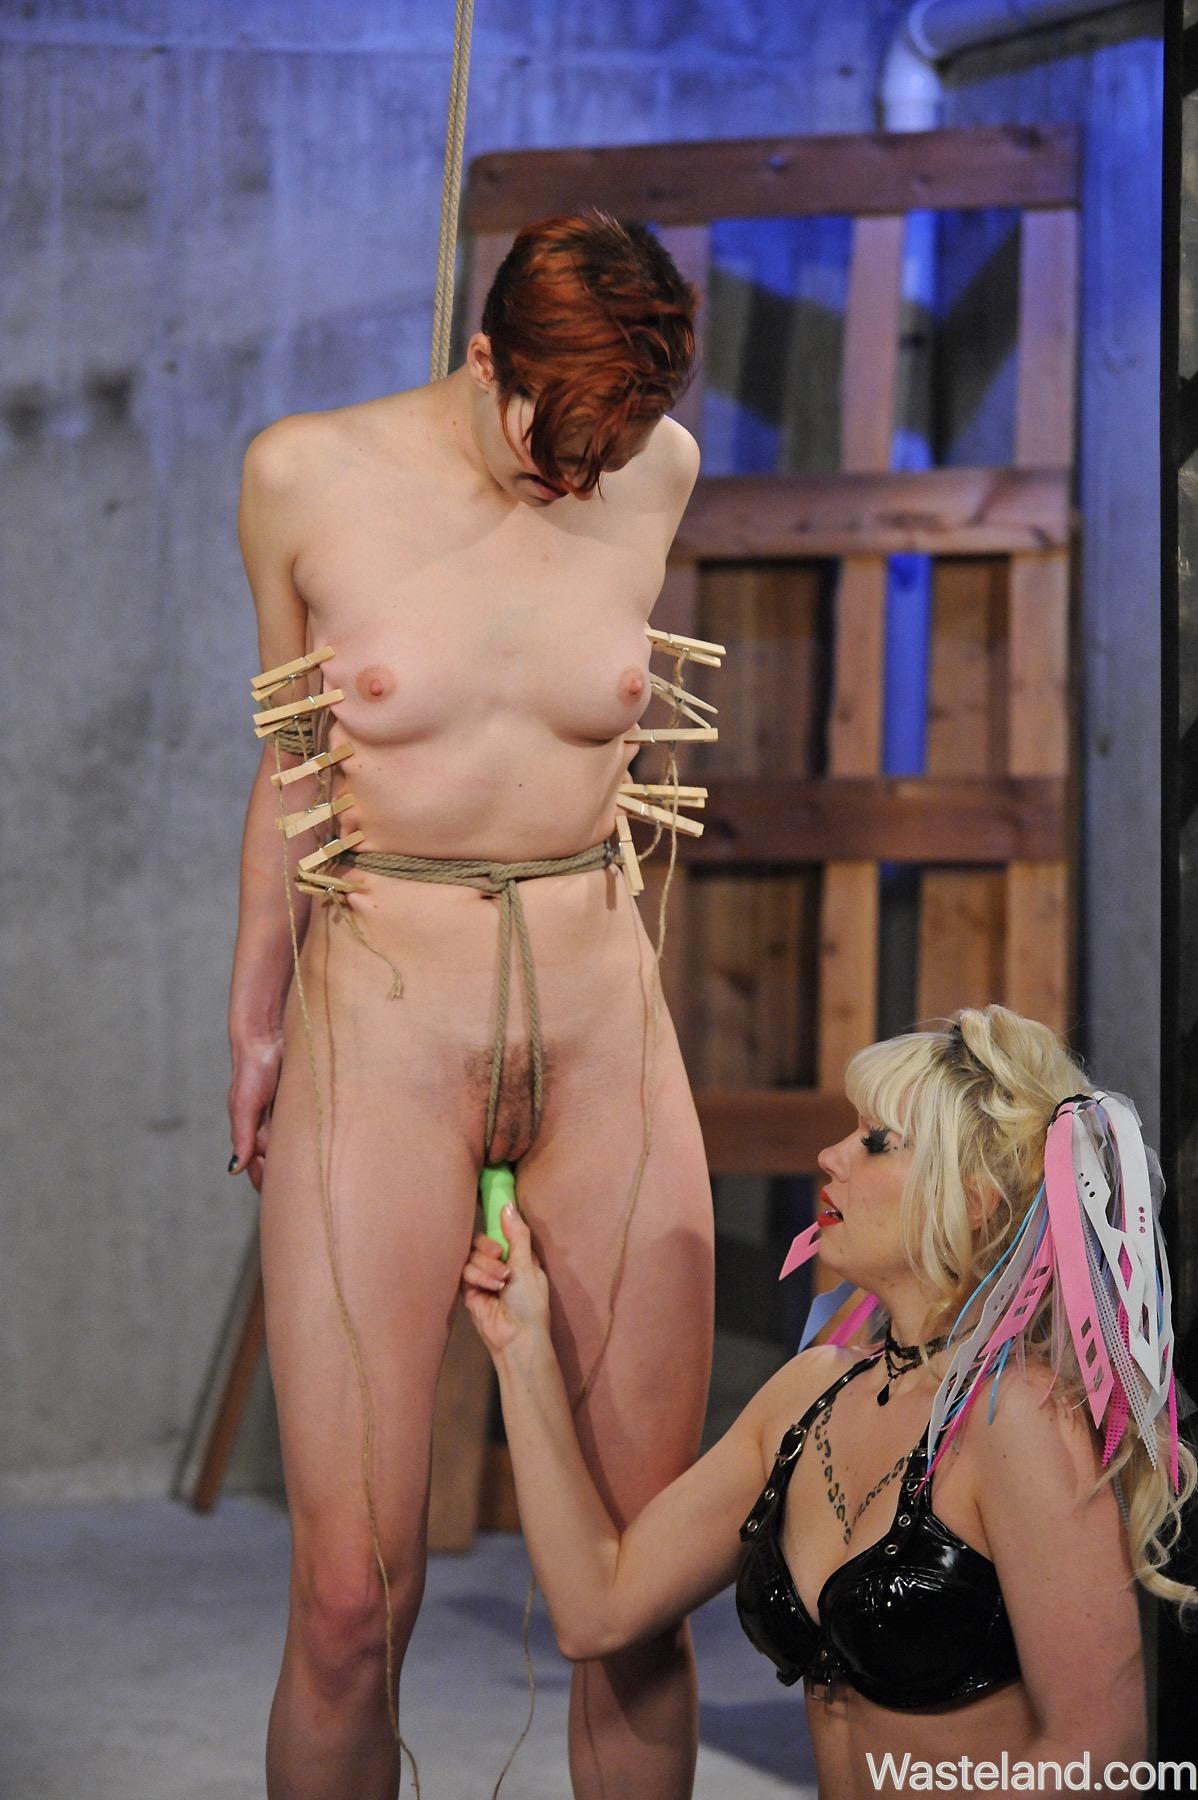 lesbian bondage sex fantasy movie